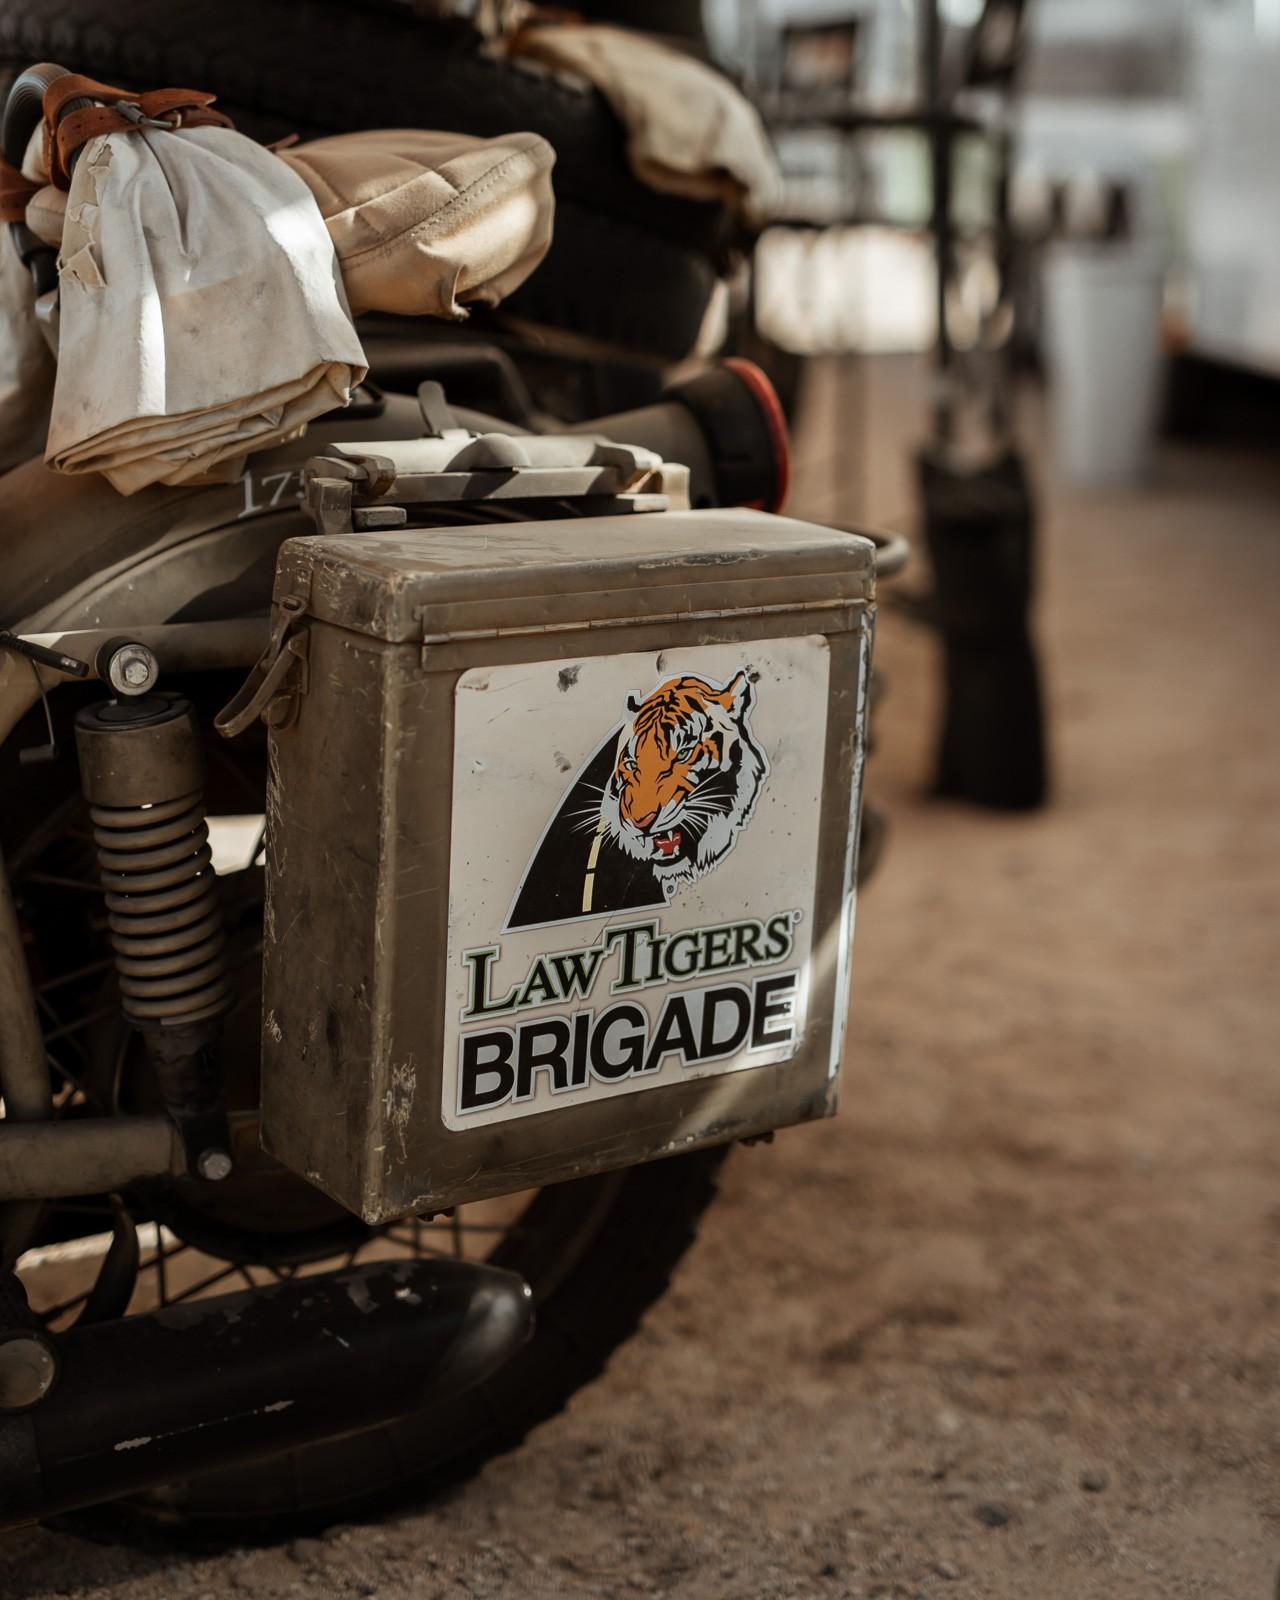 AZ Open of Motocross | Friday Racing Gallery - GuyB - Motocross Pictures - Vital MX